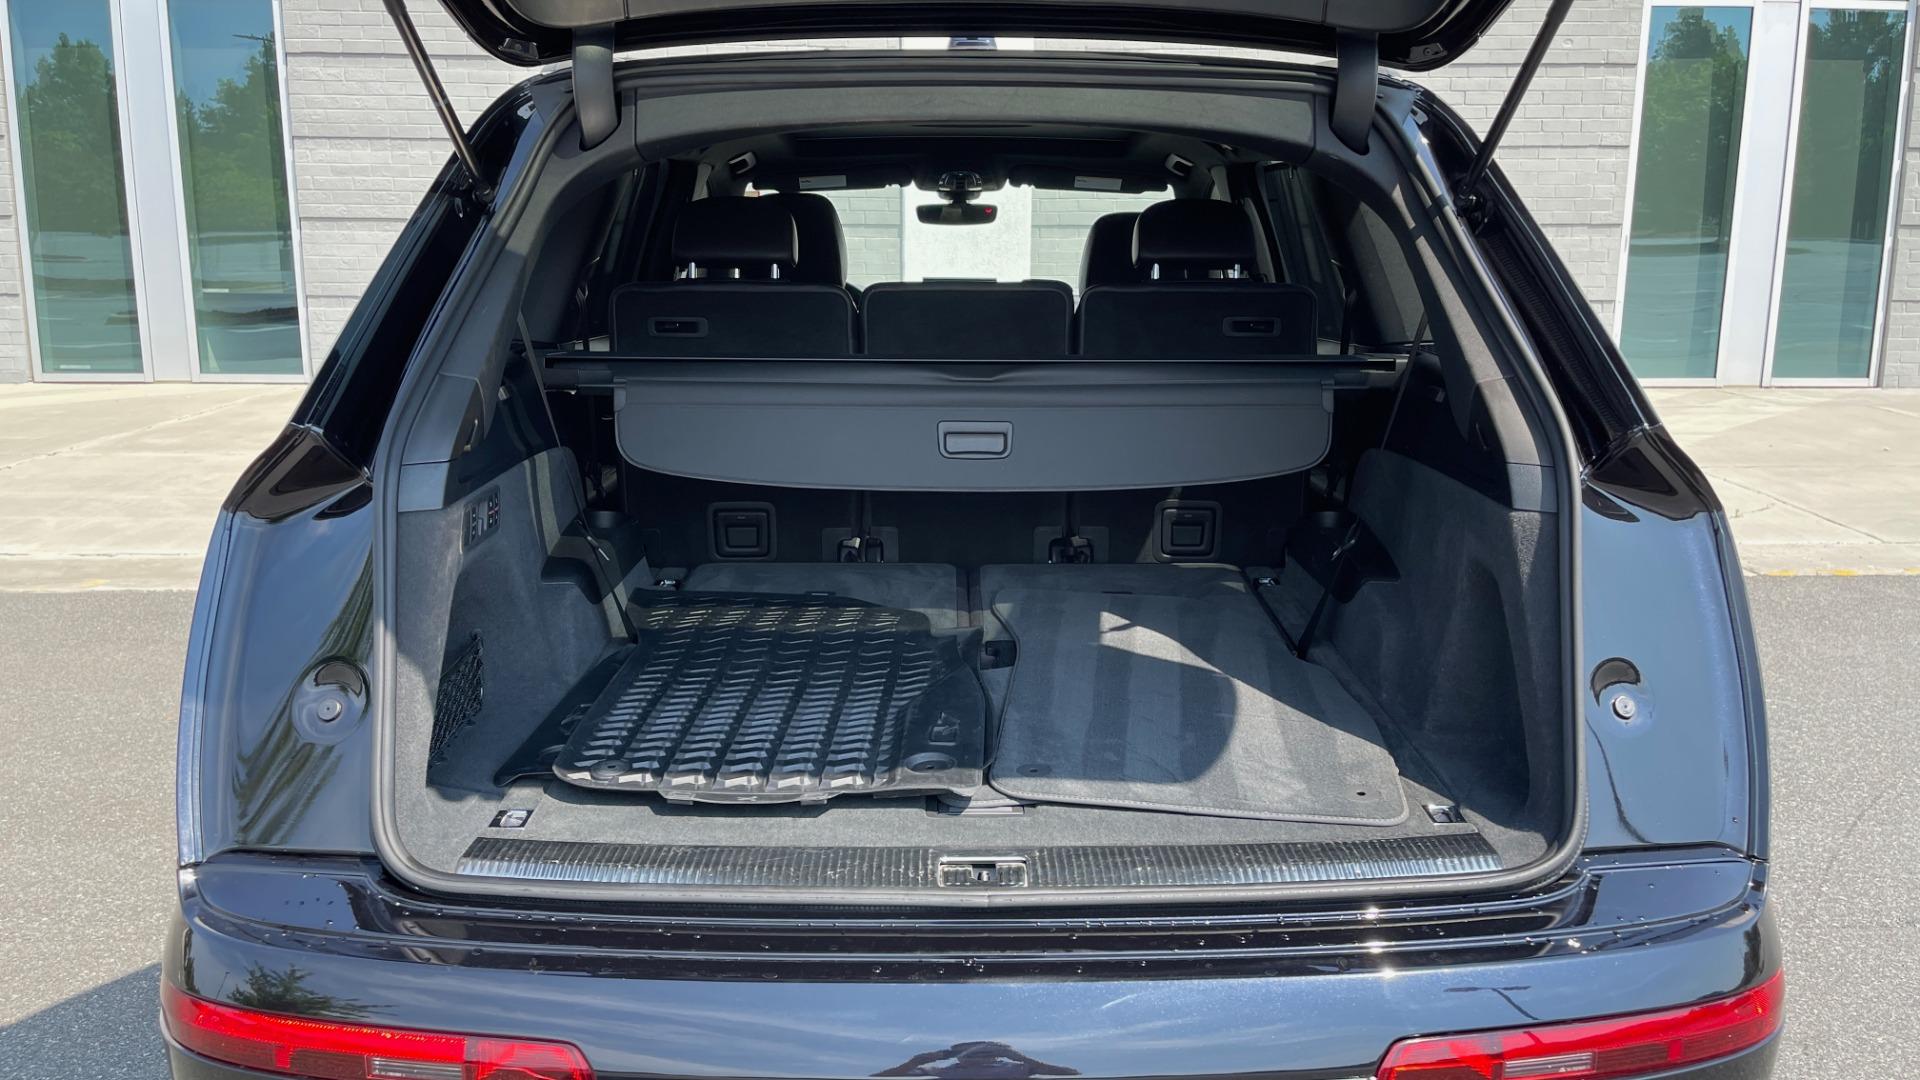 Used 2018 Audi Q7 PRESTIGE TIPTRONIC / NAV / SUNROOF / ADAPTIVE PKG / DRVR ASST / CLD WTHR /  for sale $49,995 at Formula Imports in Charlotte NC 28227 16